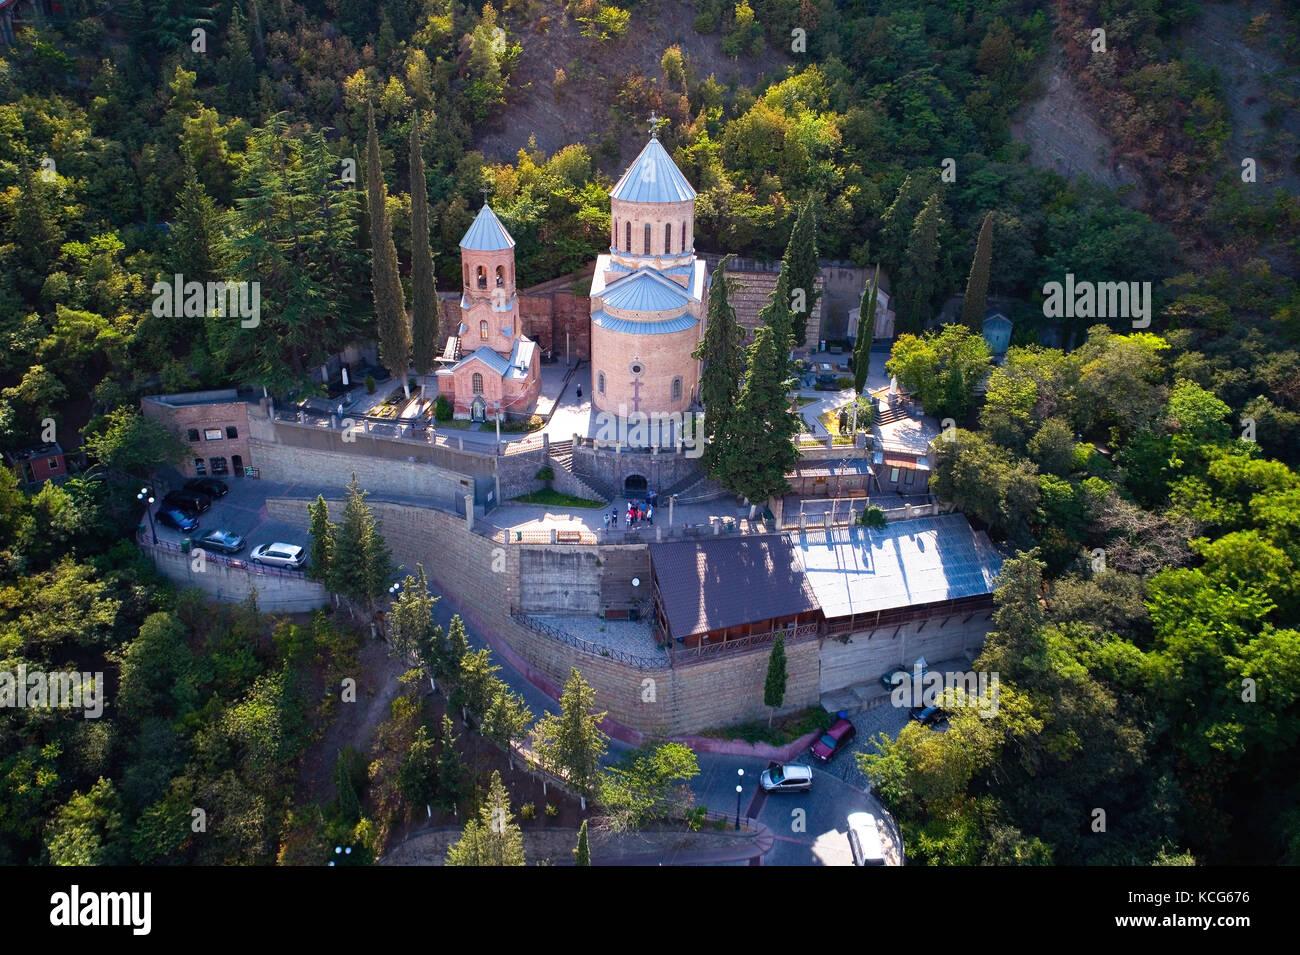 Tiflis, Georgien, 27. August 2017: Kirche von St. David. Stockbild